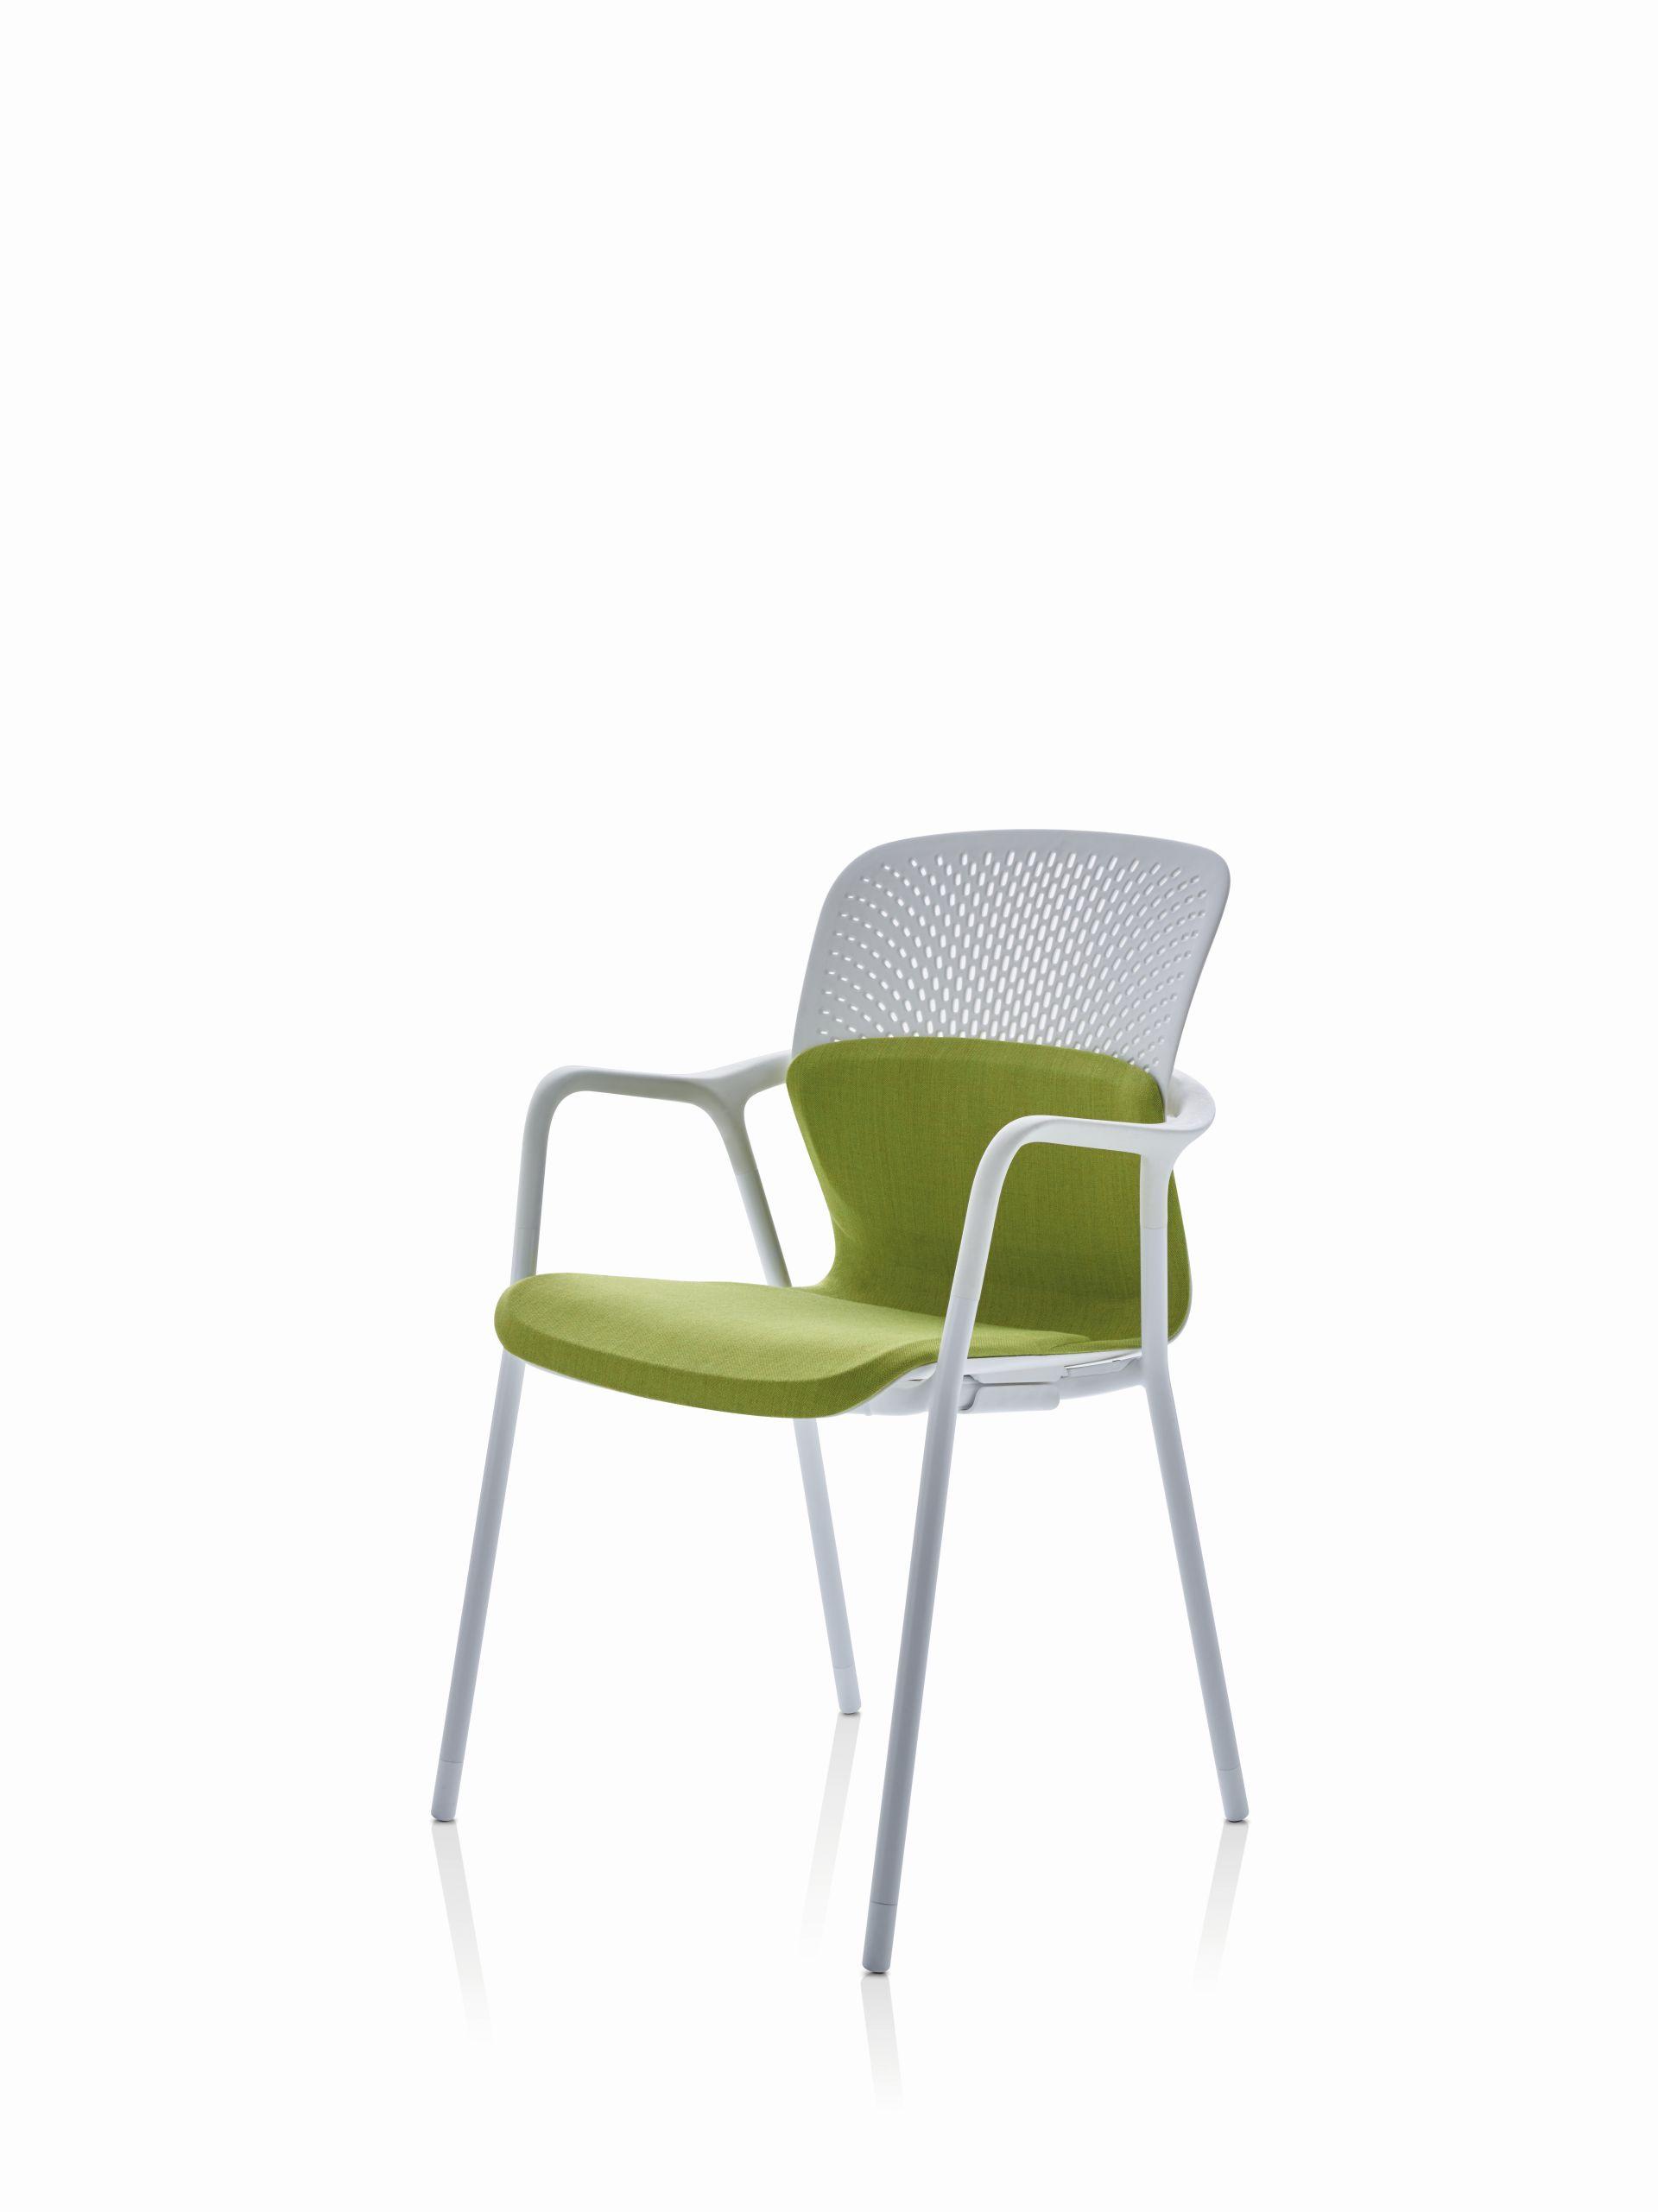 chair design love mesh pool lounge chairs keyn that